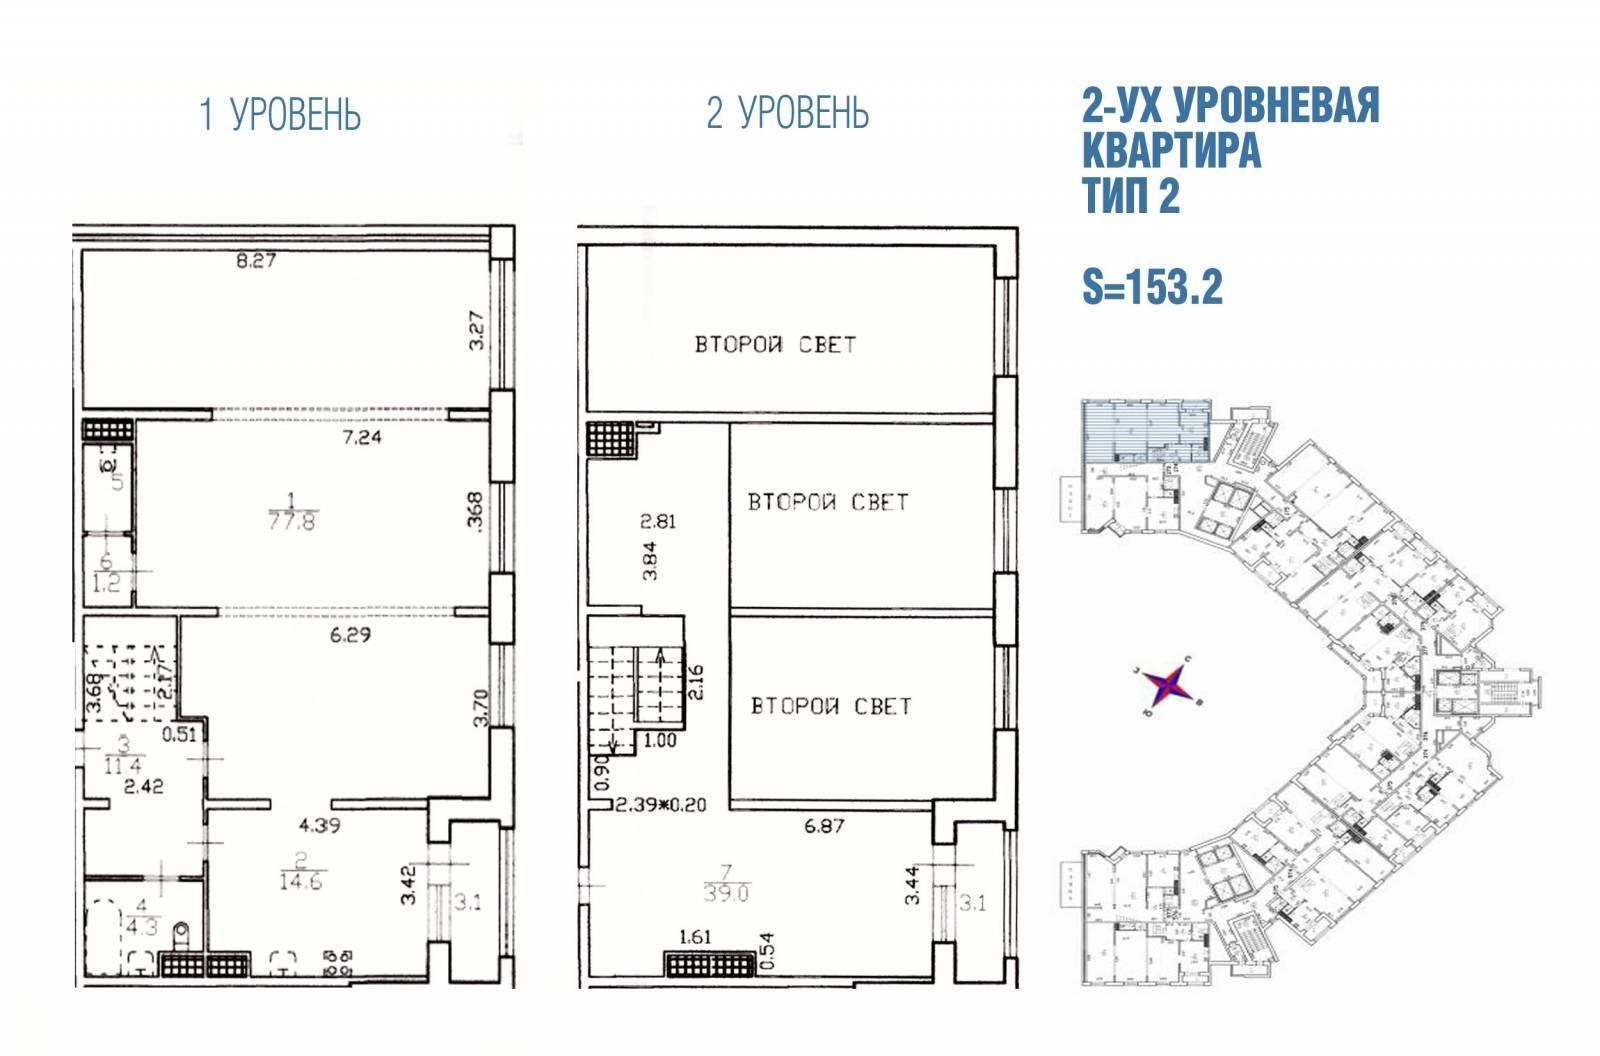 Двухуровневая квартира тип 2 S=153,2